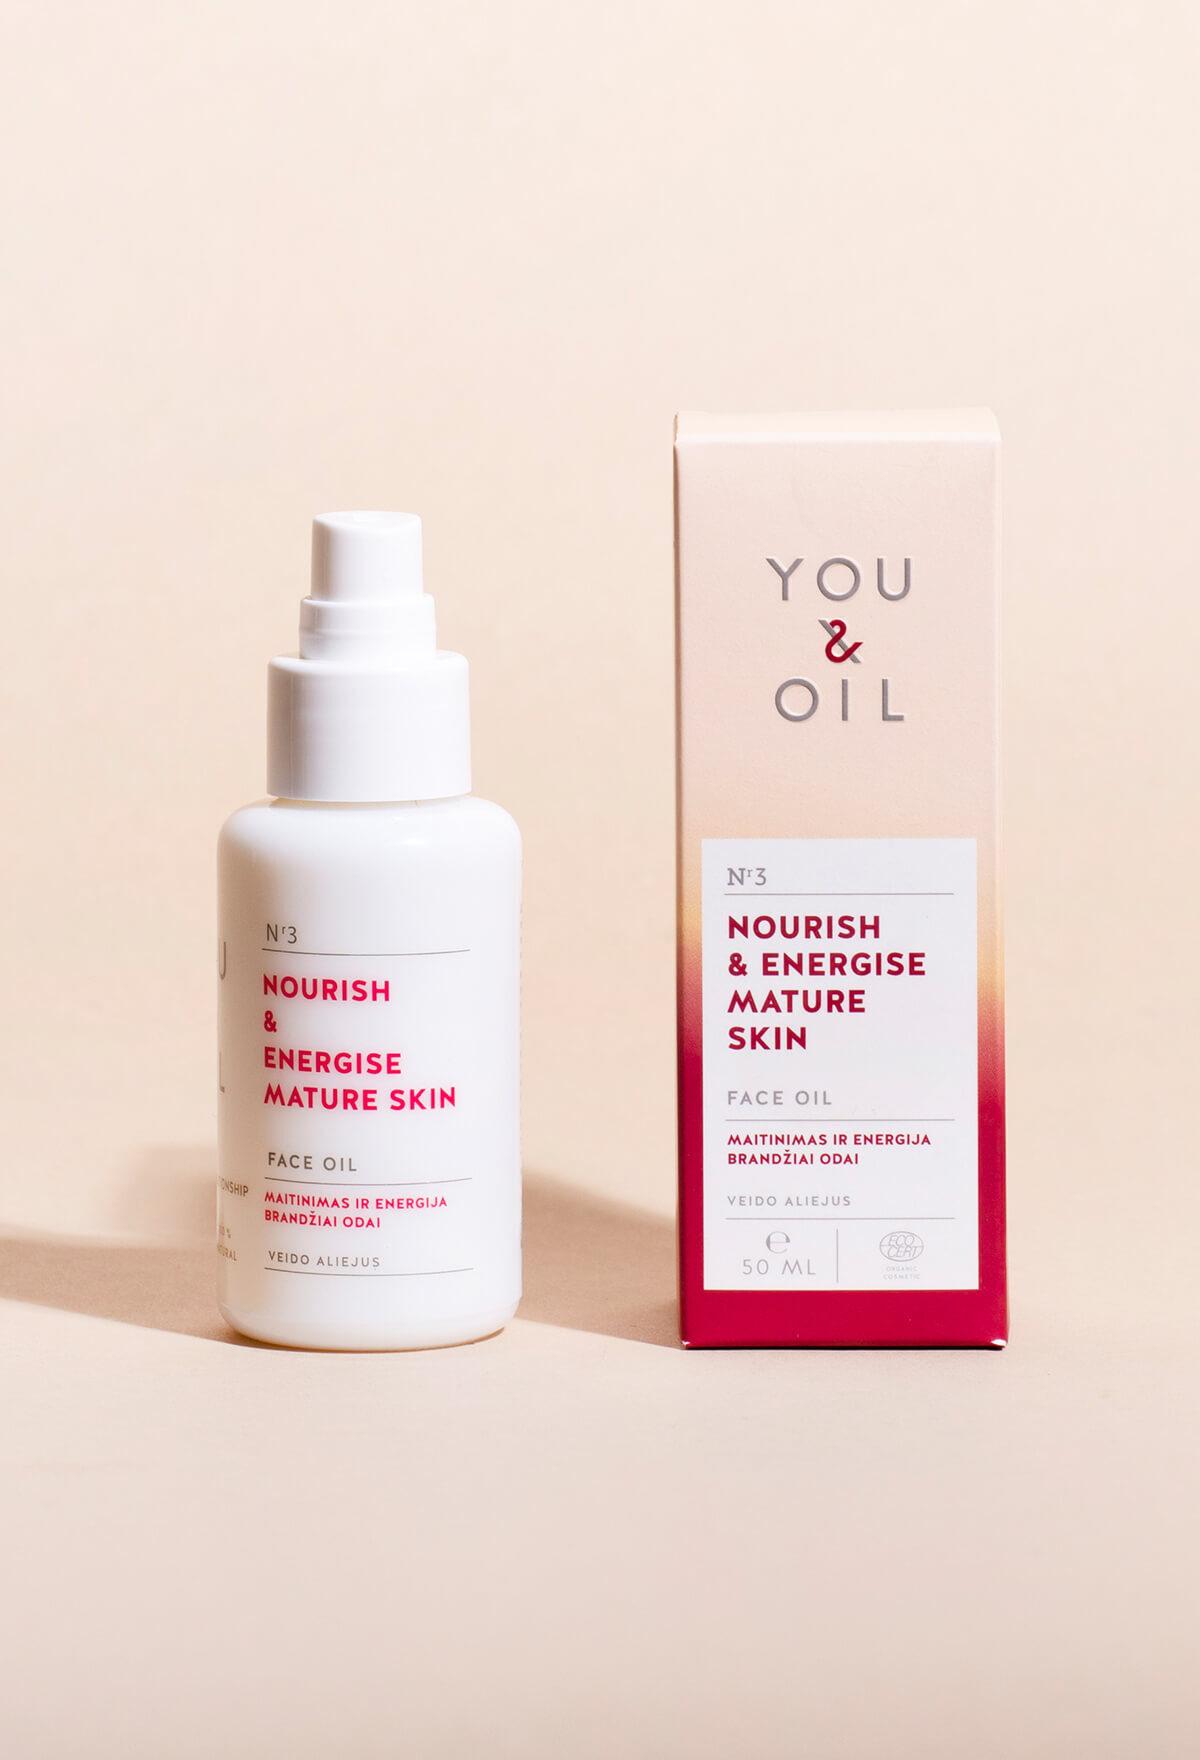 1284Nourish & Energise Mature Skin